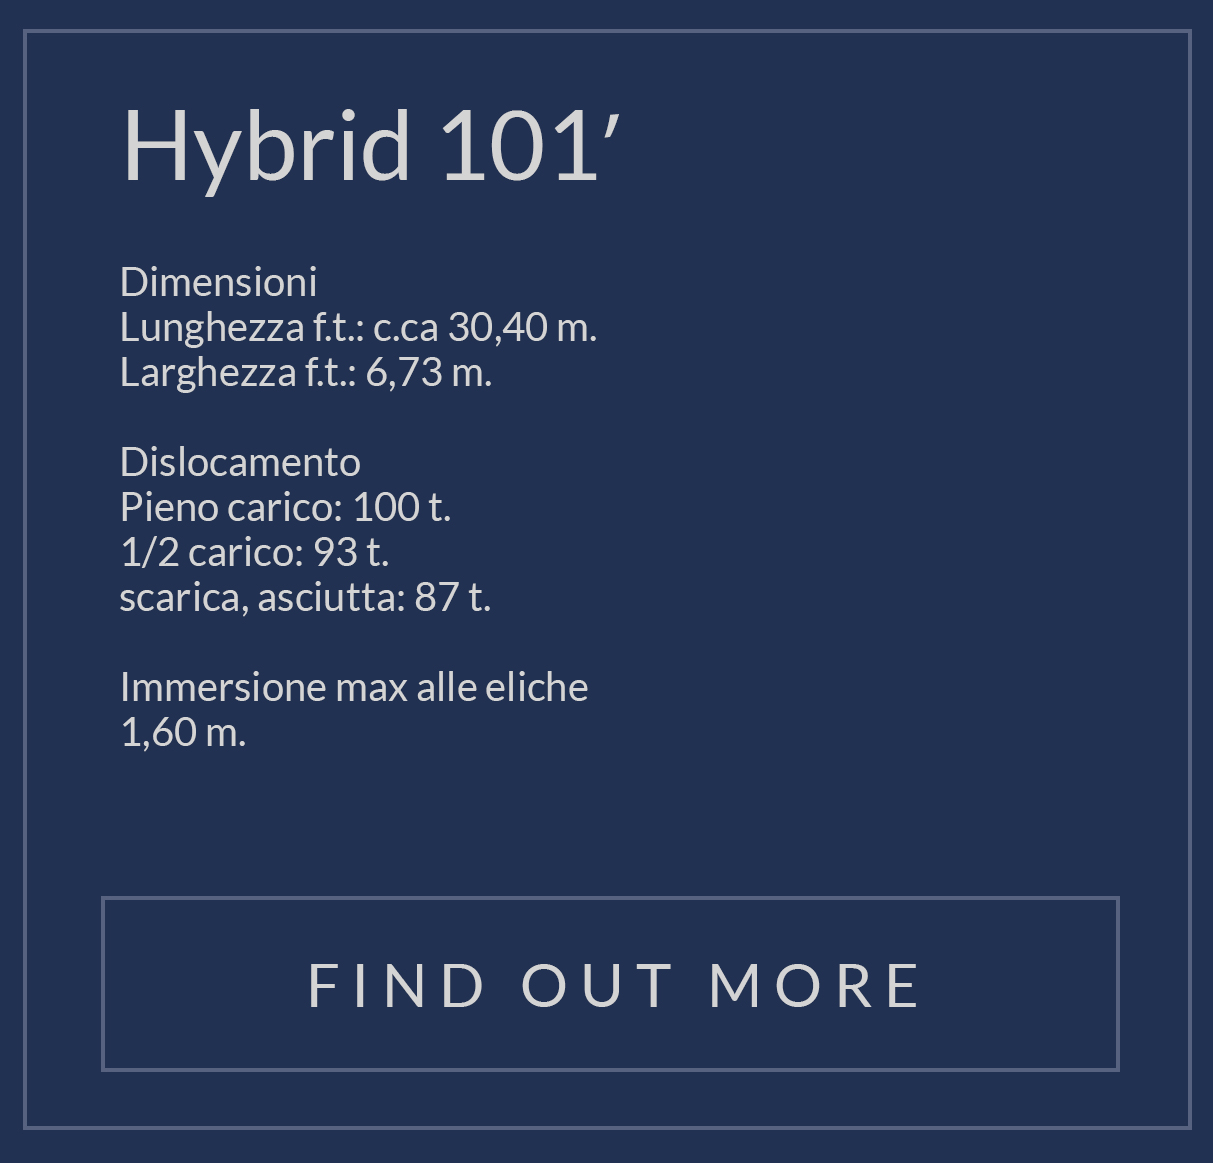 hy 101